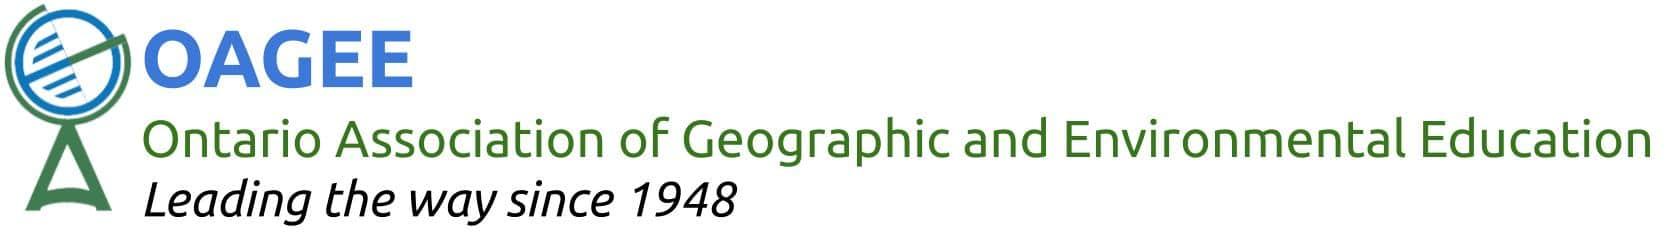 Ontario Association of Geographic and Environmental Educators